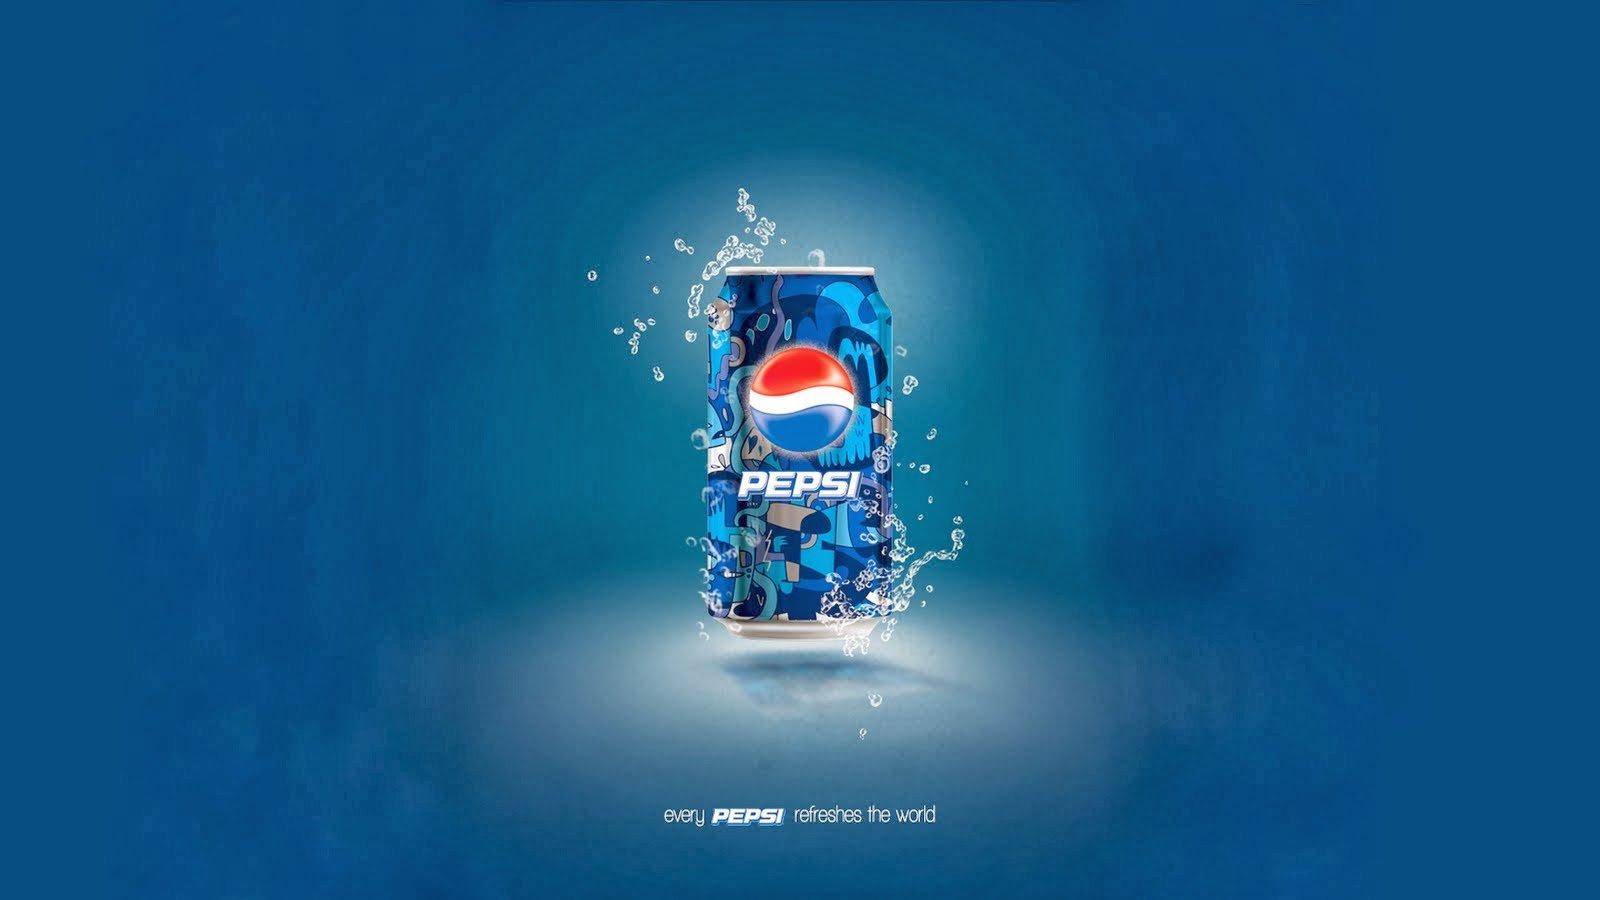 Pepsi HD Wallpapers HD Wallpapers 360 1600x900